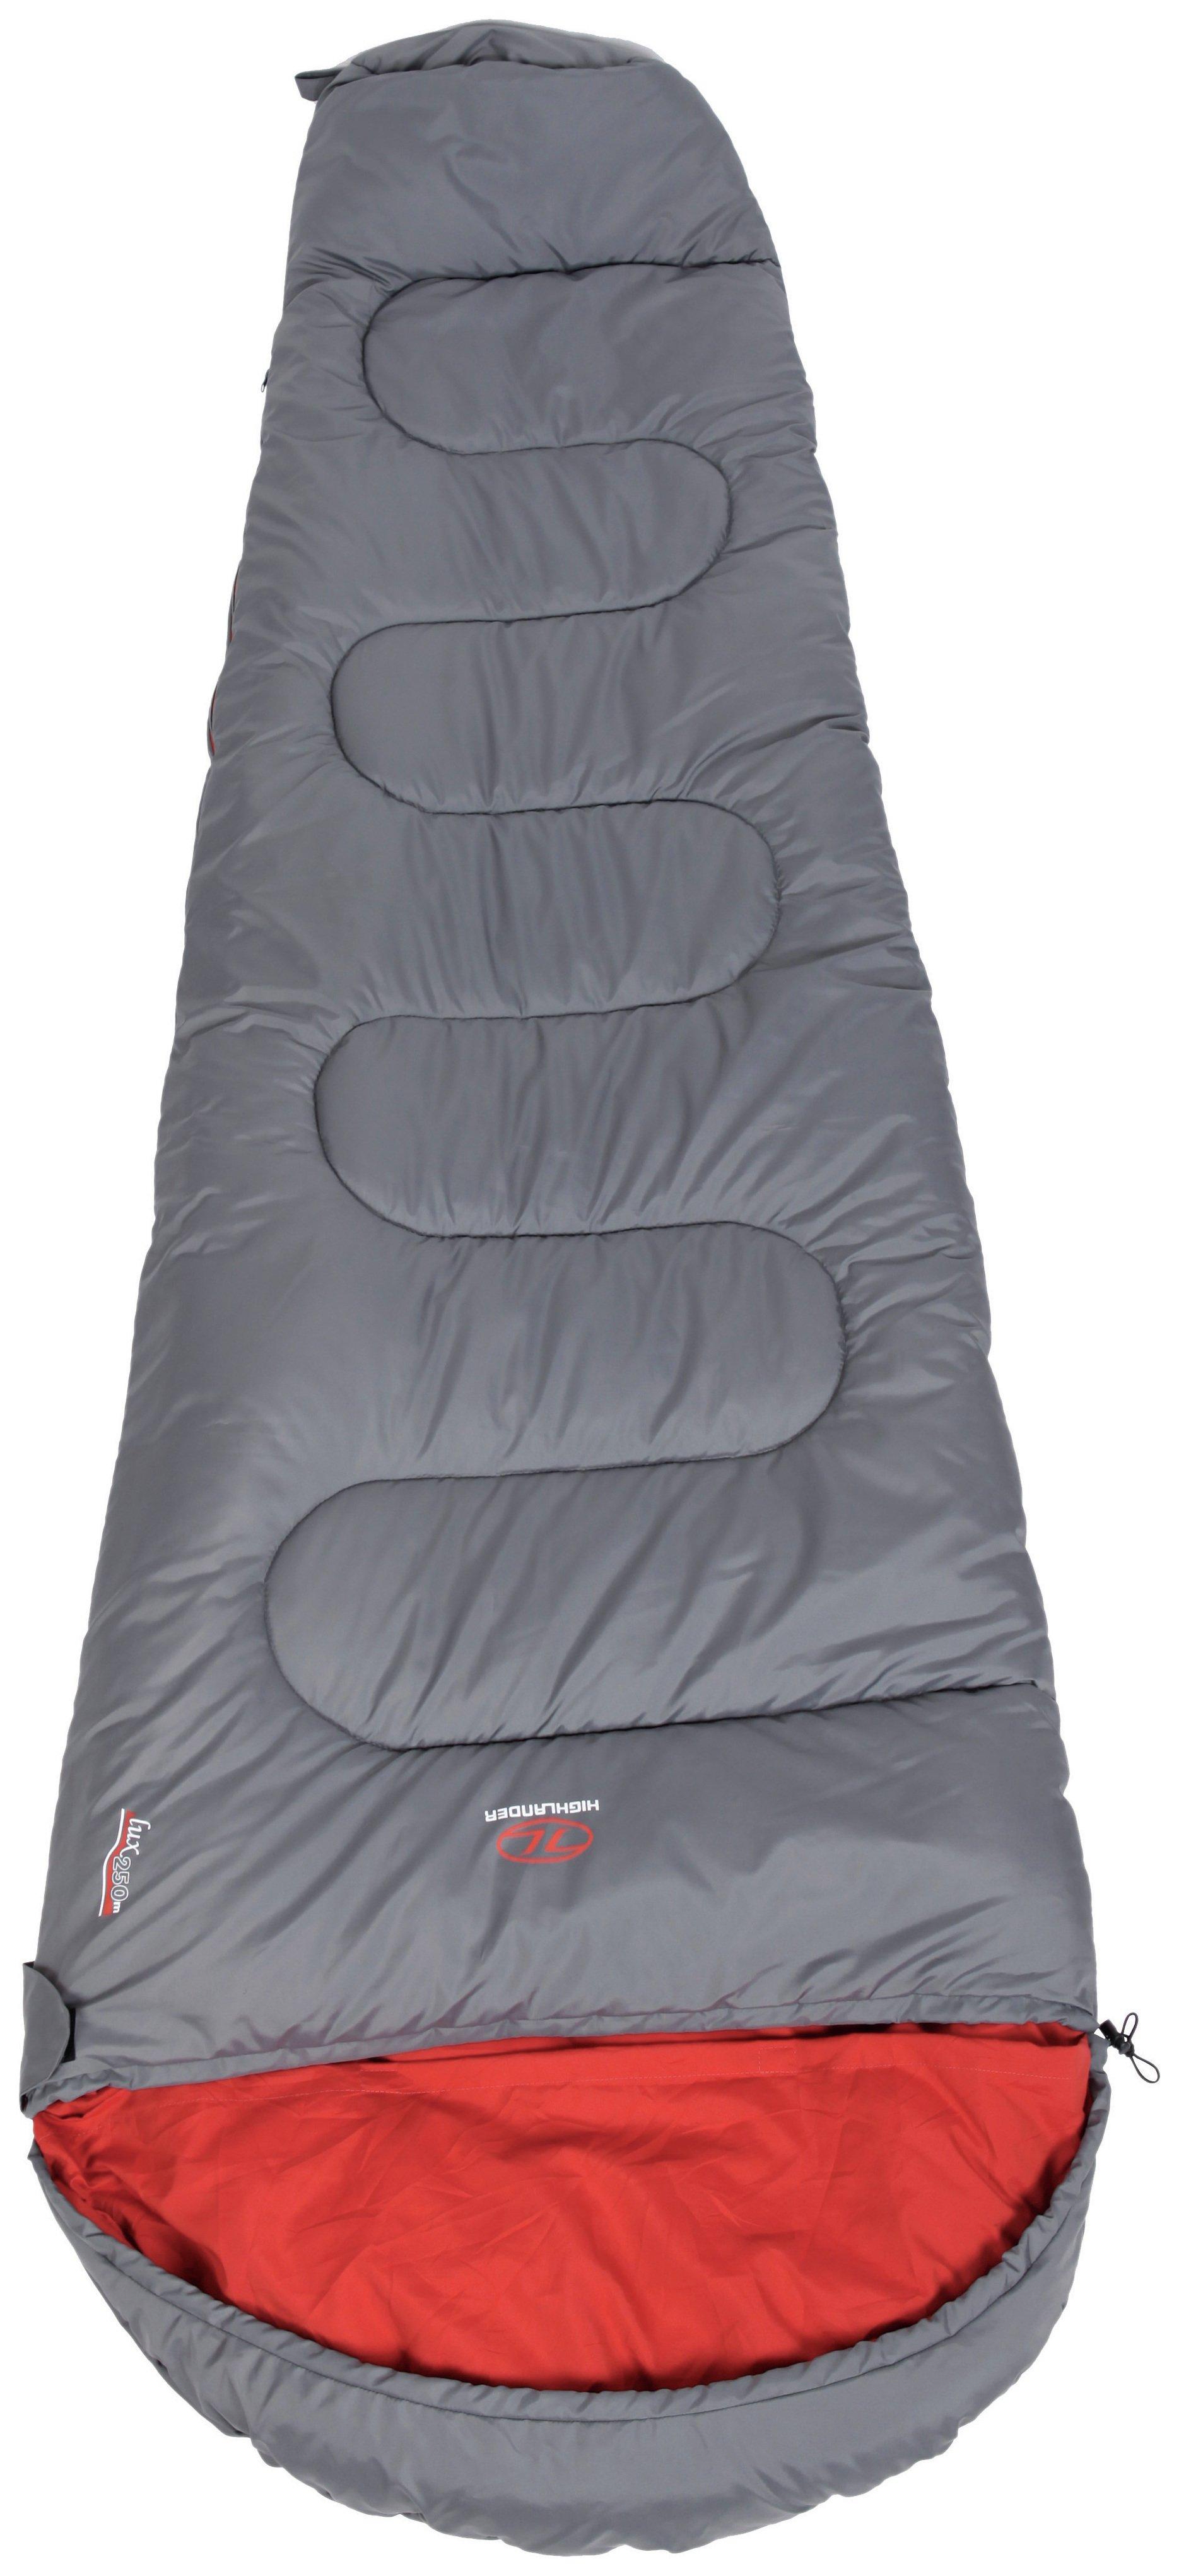 Highlander - 250GSM - Single Mummy Sleeping Bag lowest price